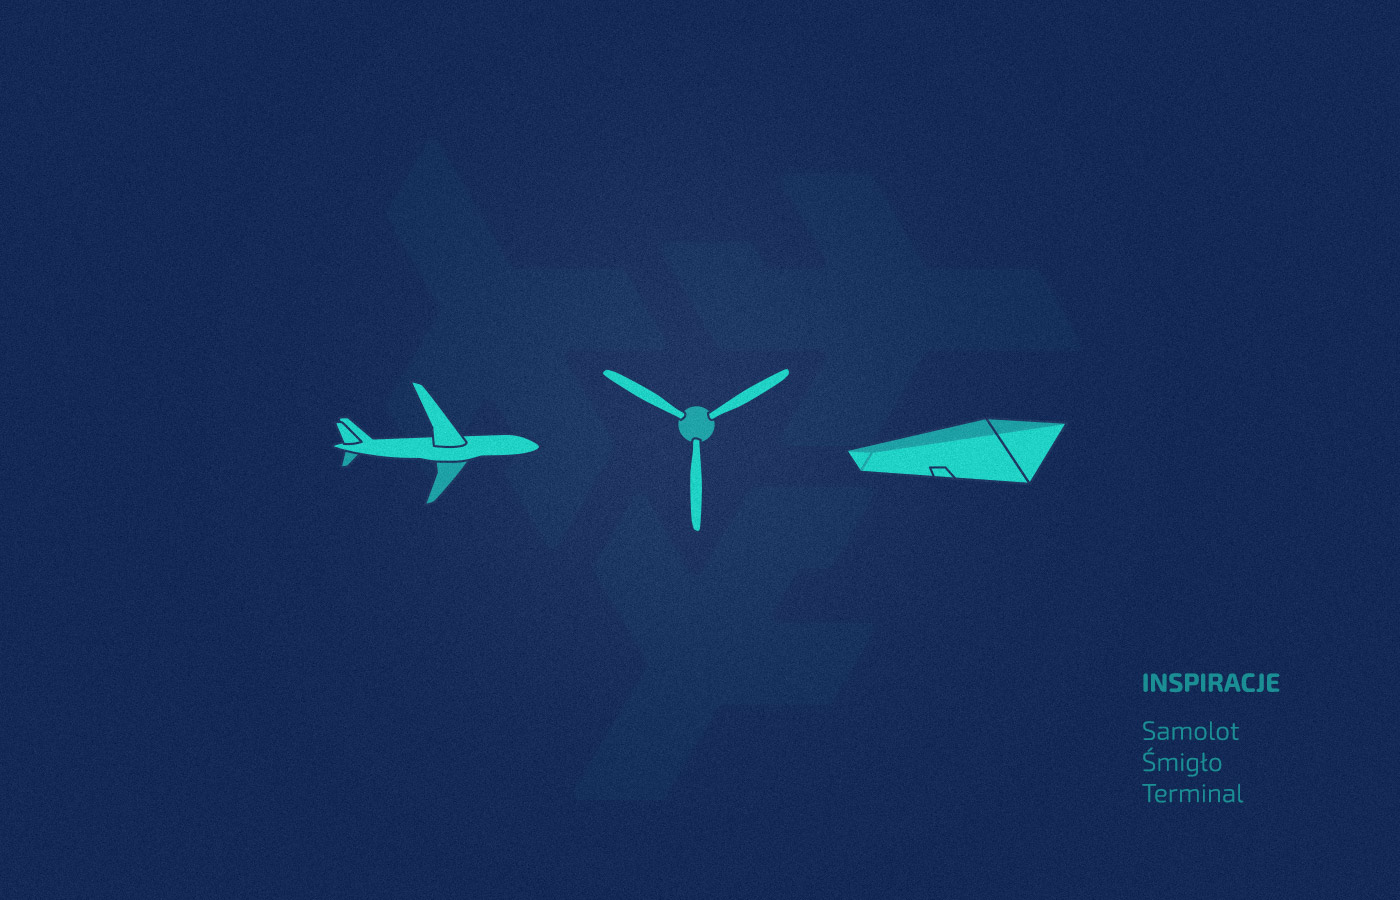 samolot lotnisko logo plane airport air triangle geometric